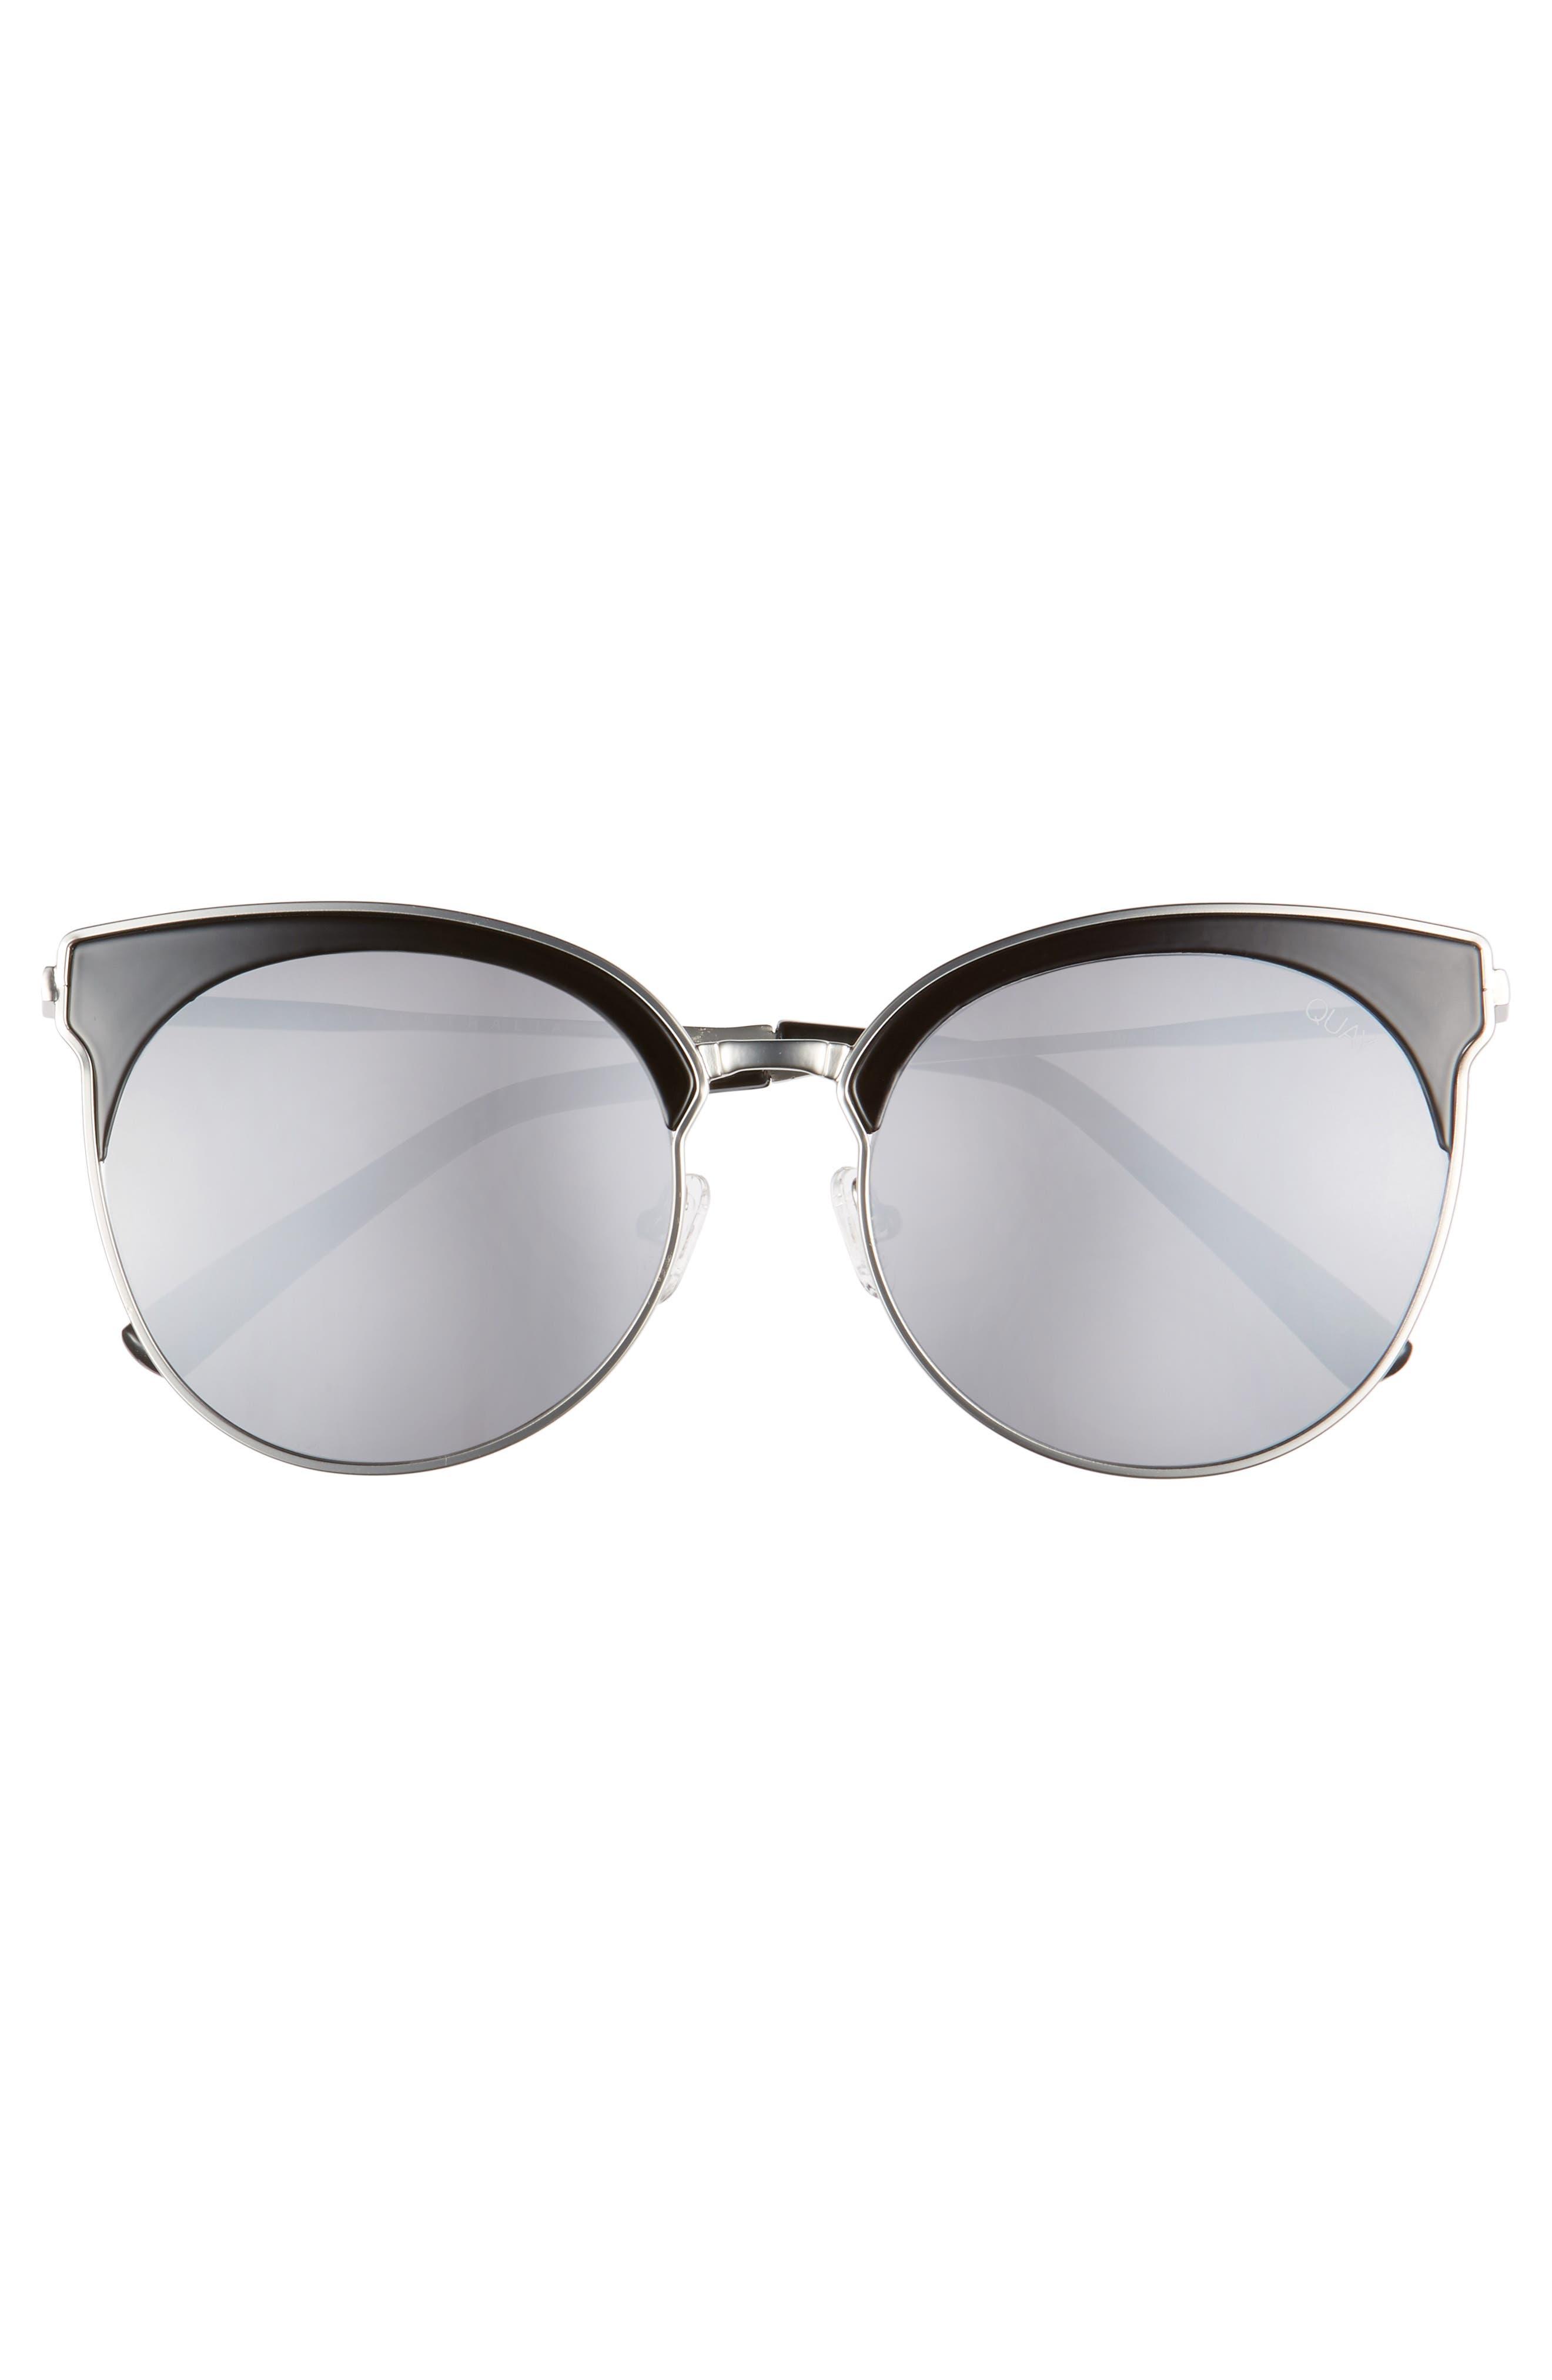 Mia Bella 56mm Sunglasses,                             Alternate thumbnail 3, color,                             001